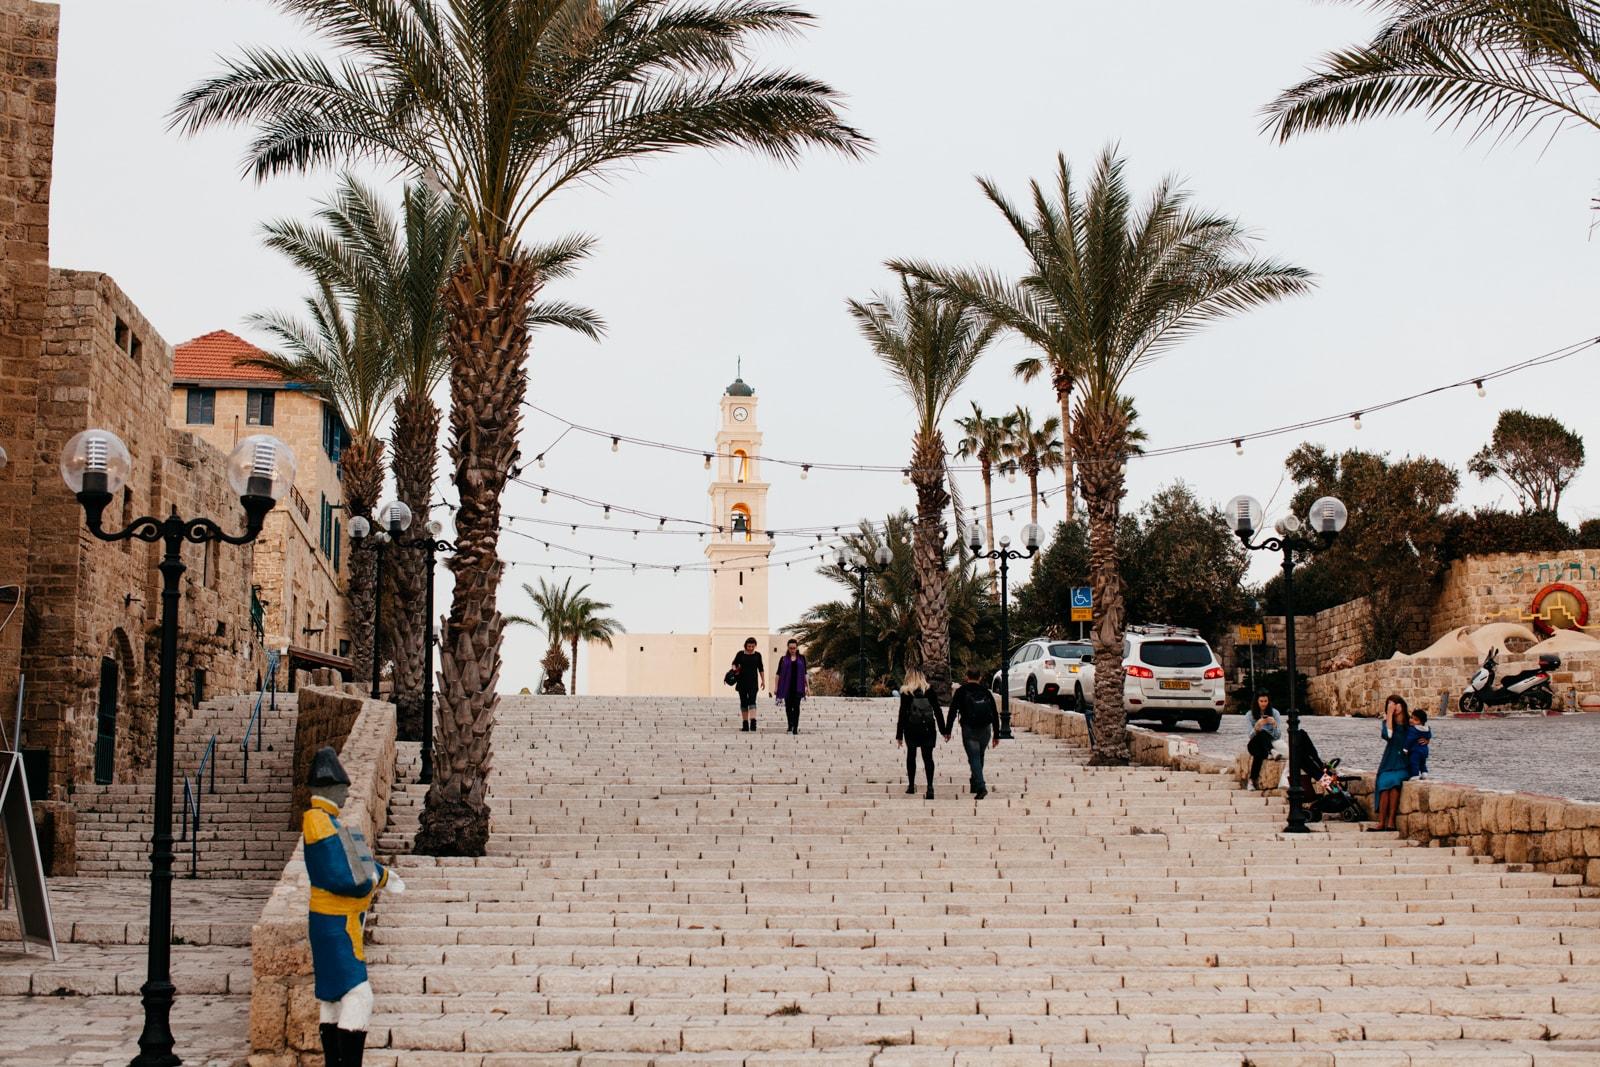 KCTP00019-STEPS-JAFFA OLD CITY-TEL AVIV-ISRAEL-GRANT